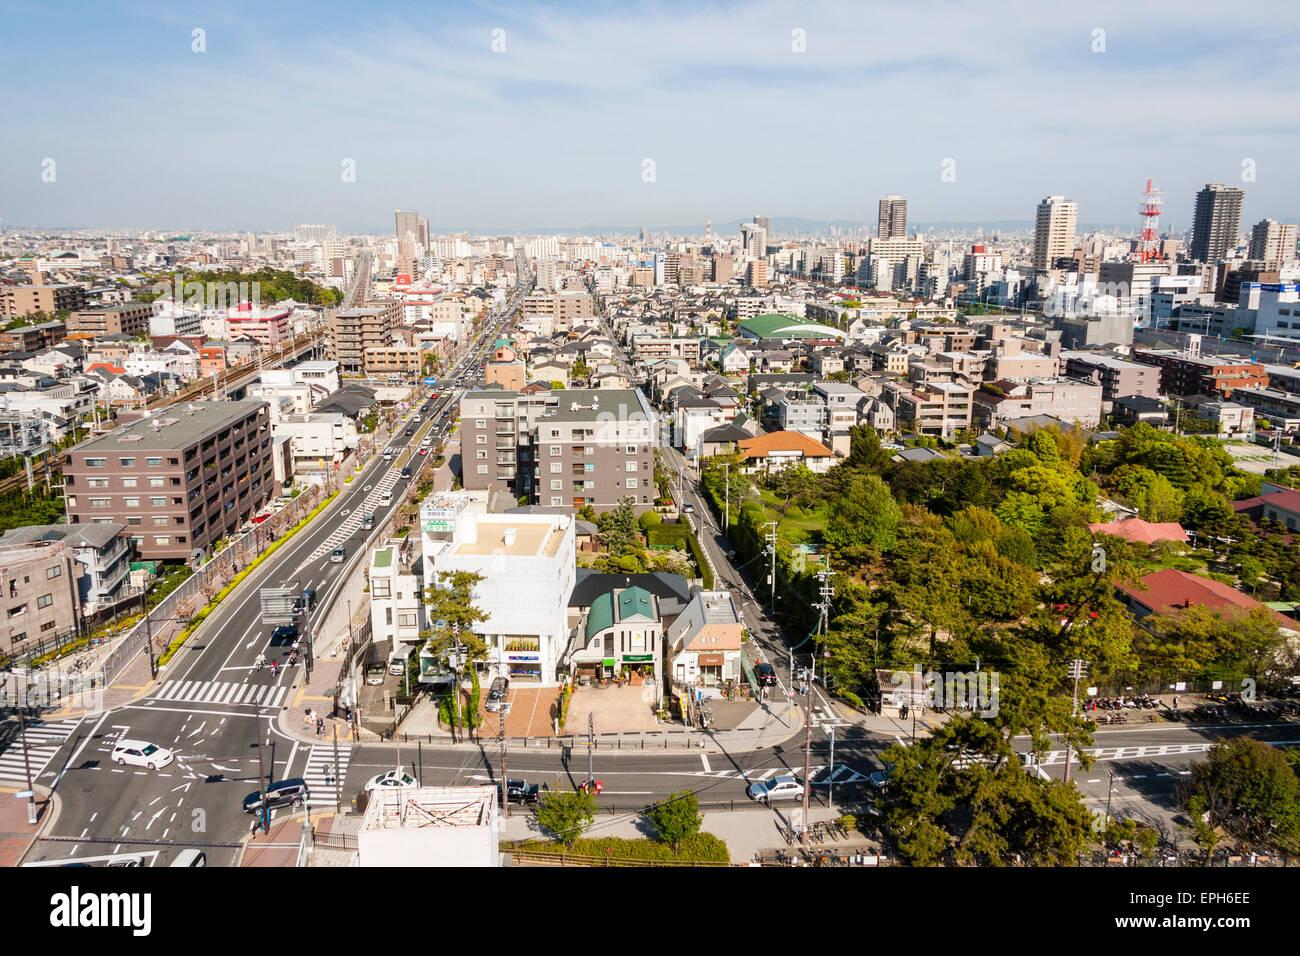 Japan, Nishinomiya, Shukugawa. Ariel view of town, towards Osaka, showing Hankyu and JR railway lines and main street. - Stock Image